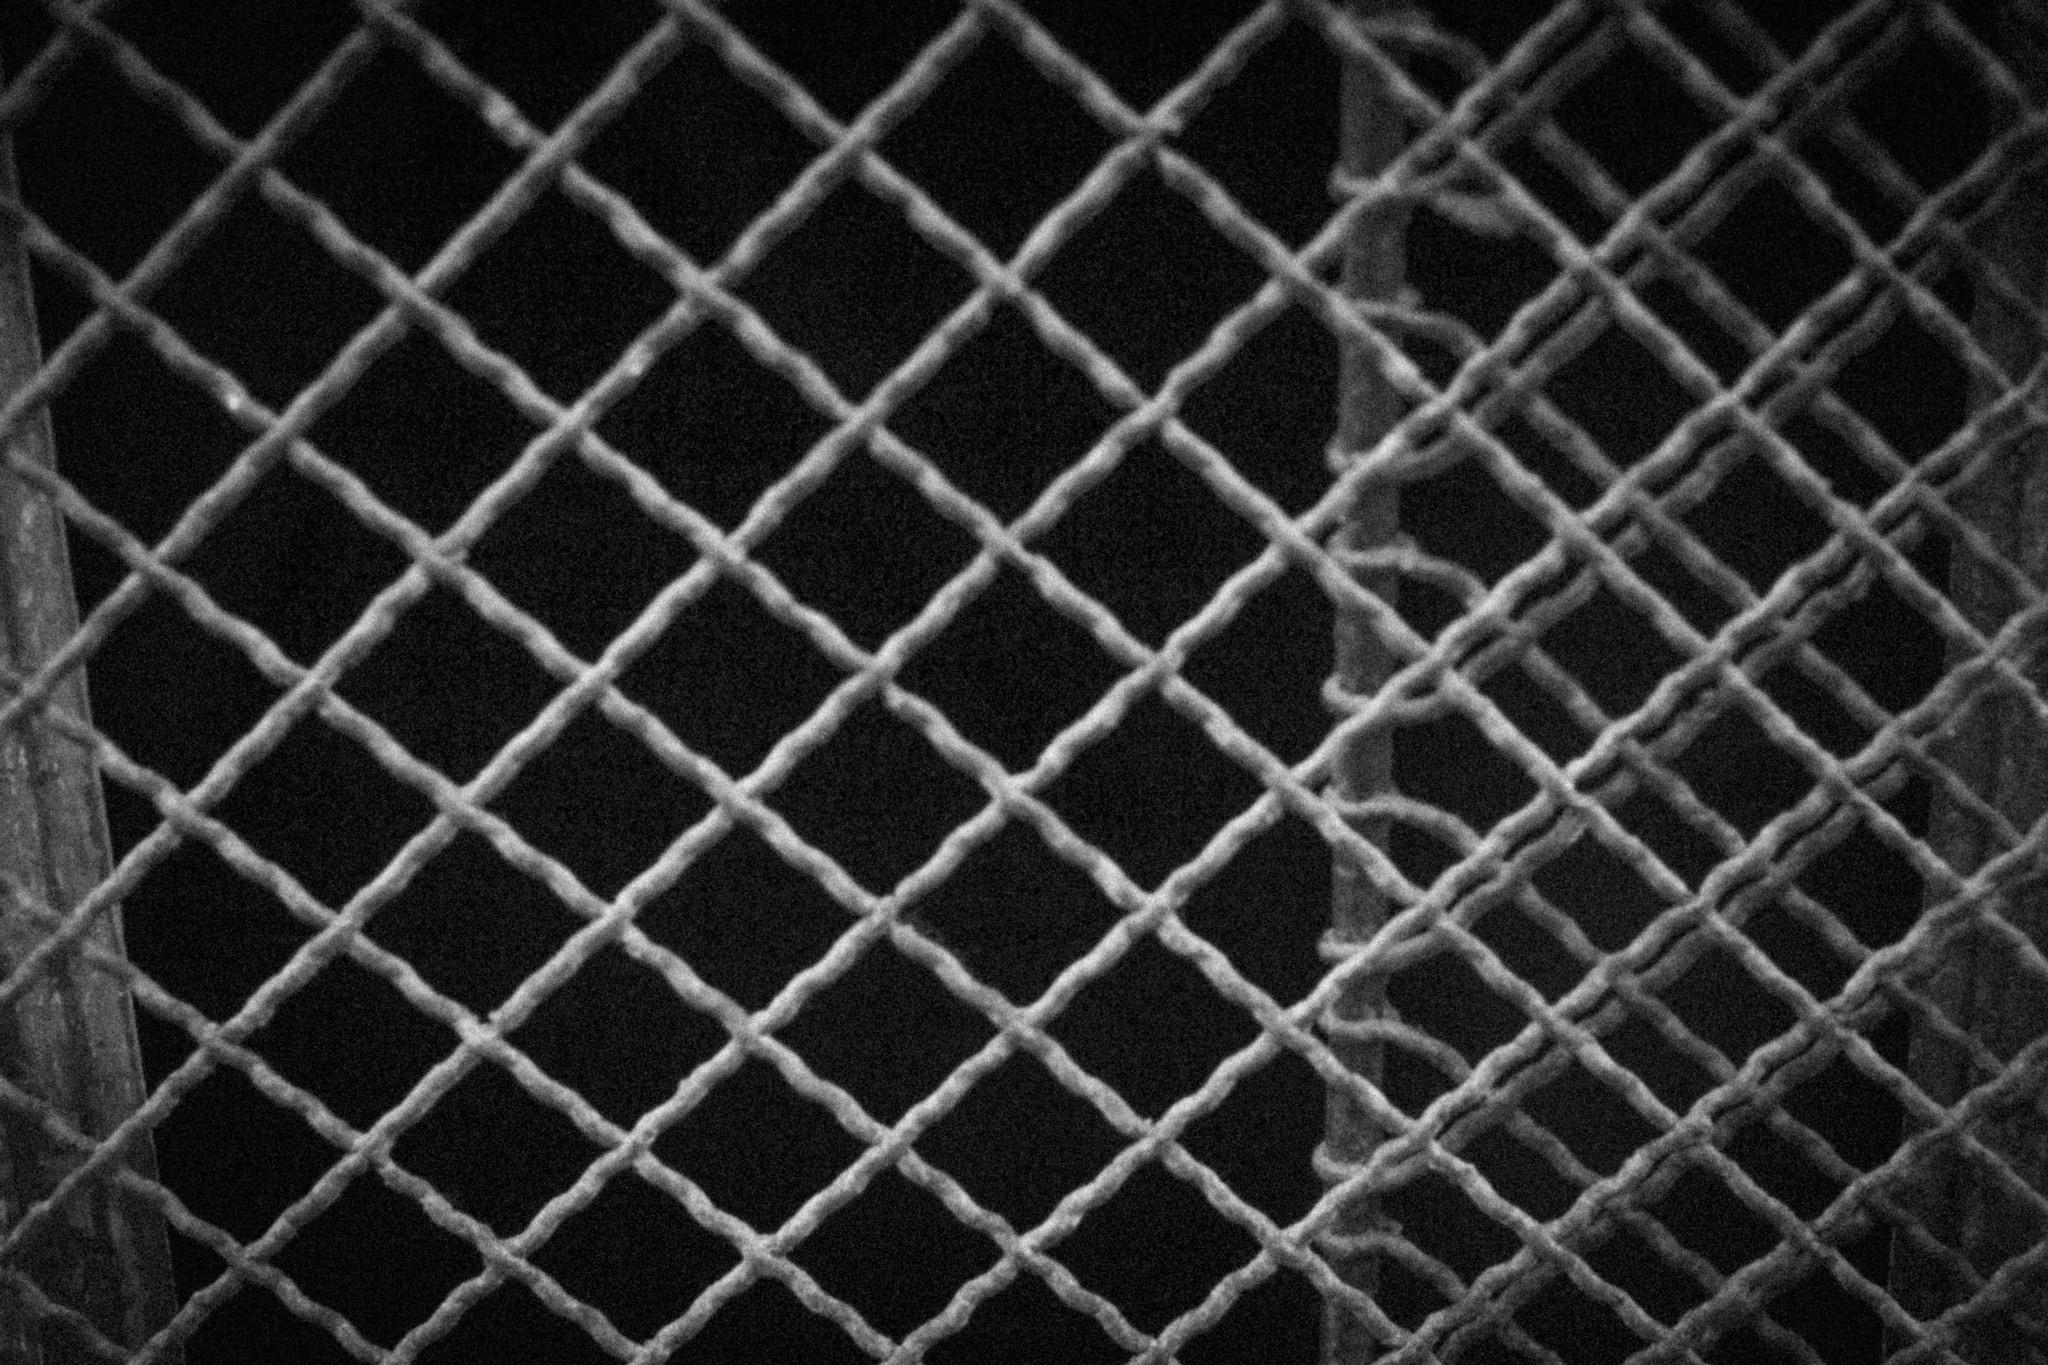 dead-budapest-rfm-2012-14.jpg